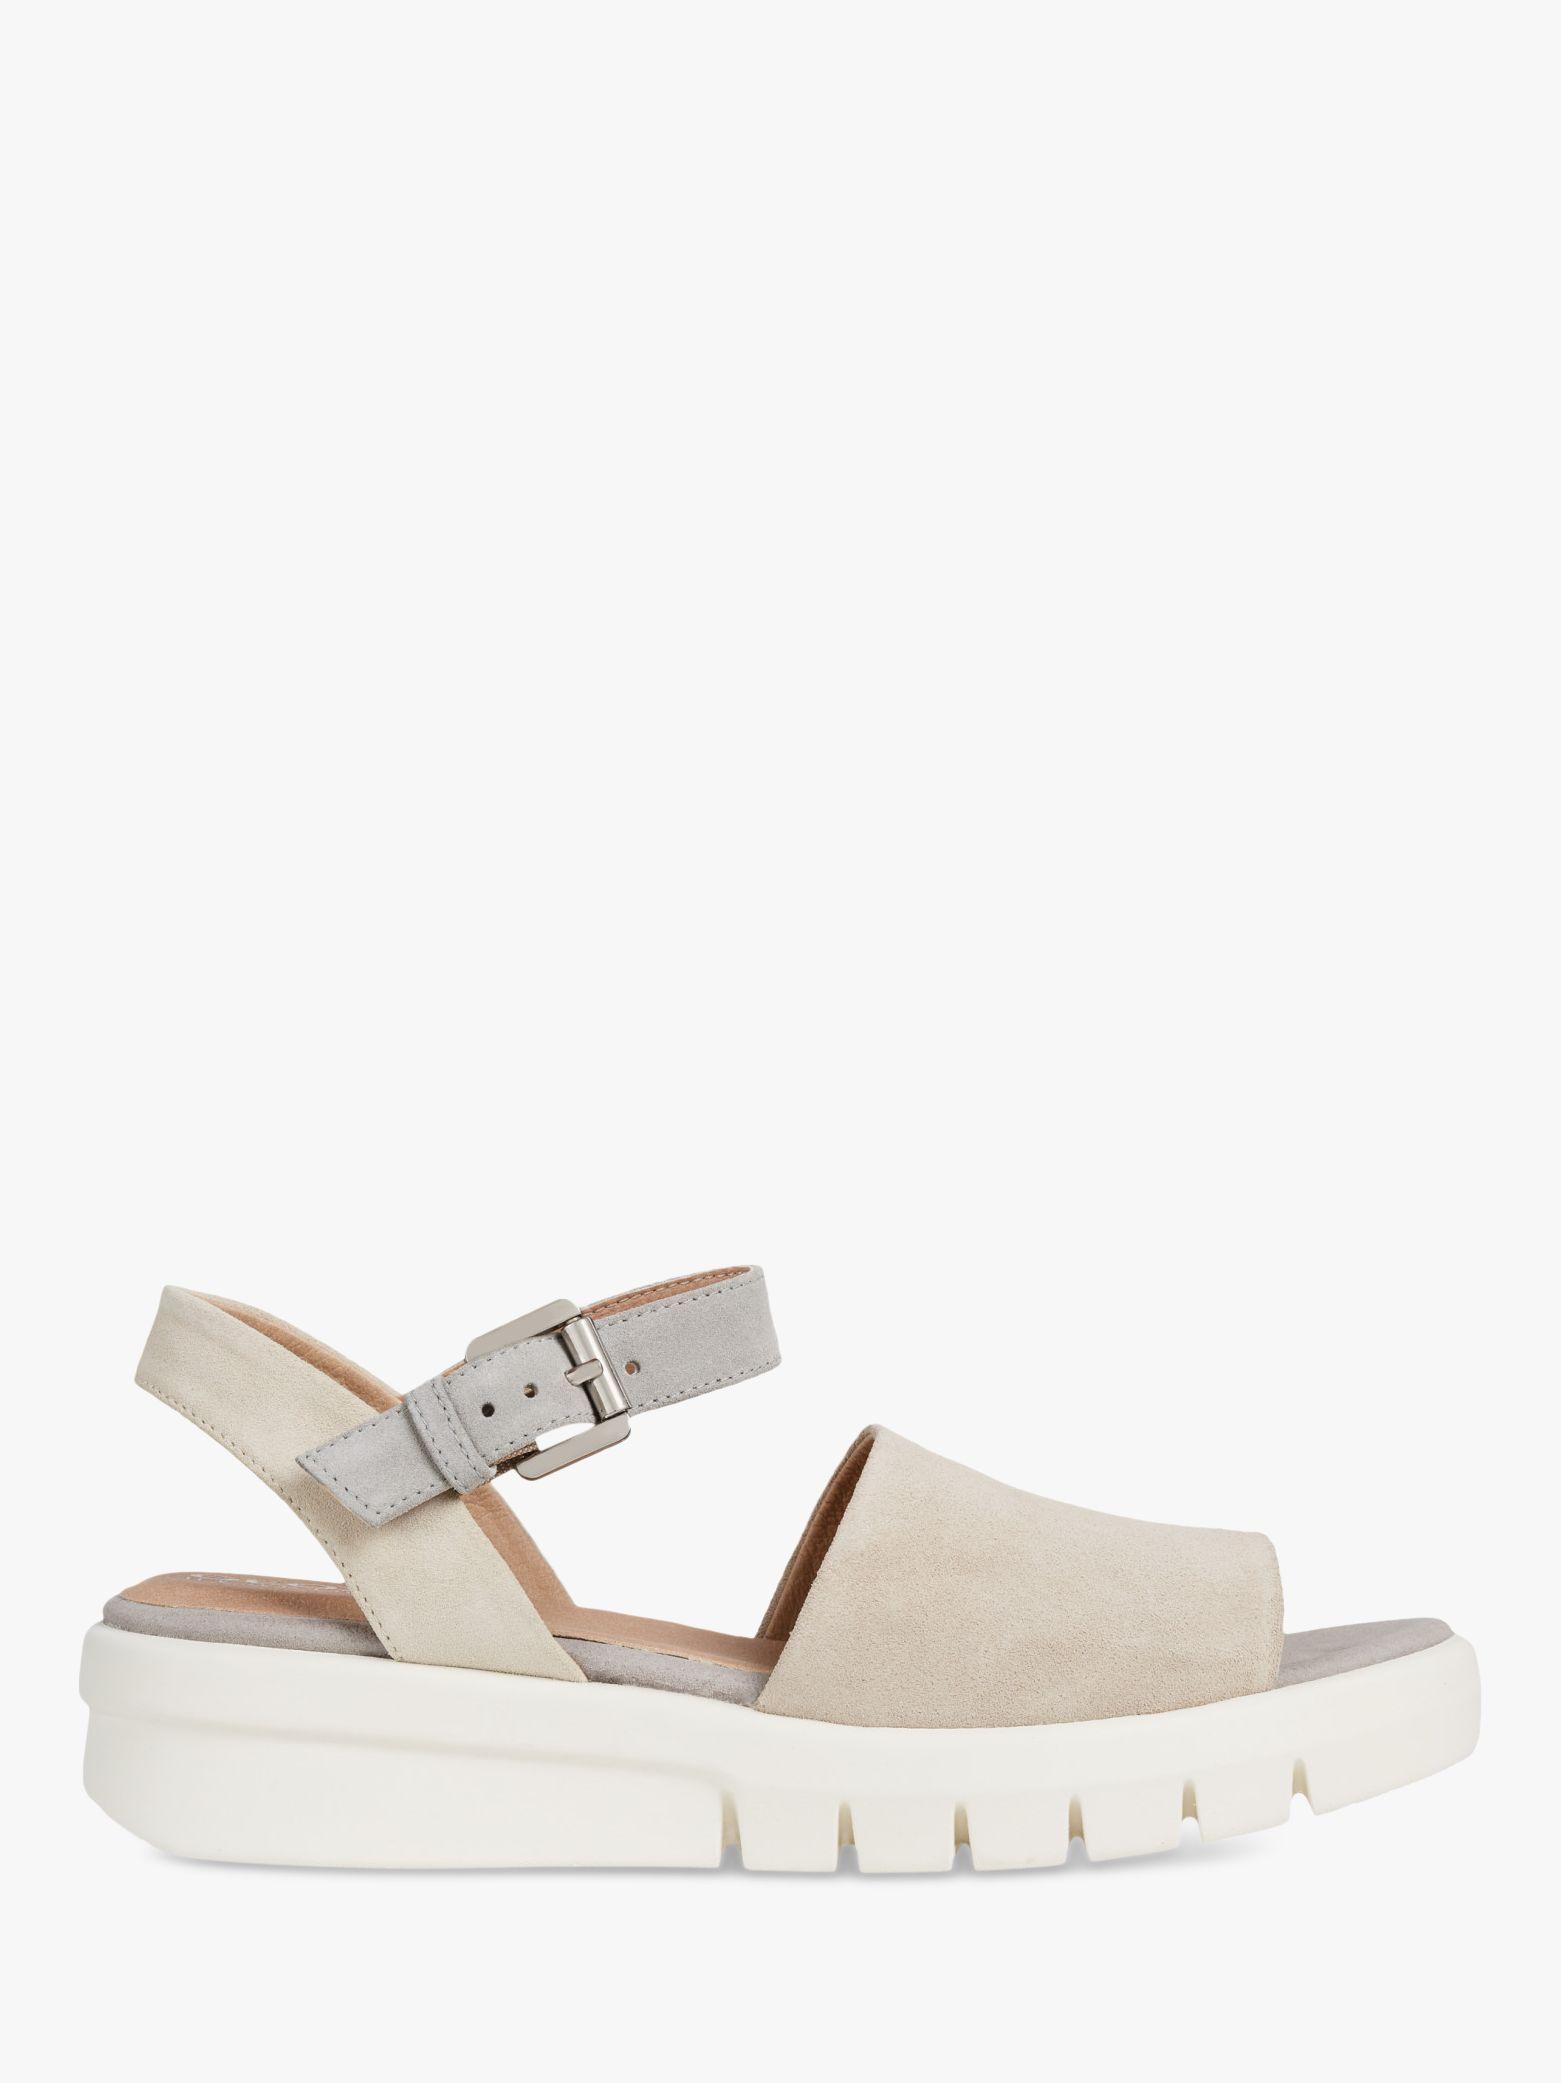 recoger Excelente calidad materiales de alta calidad Geox Women's Wimbley Flatform Sandals, Light Taupe/Cream | Sandals ...